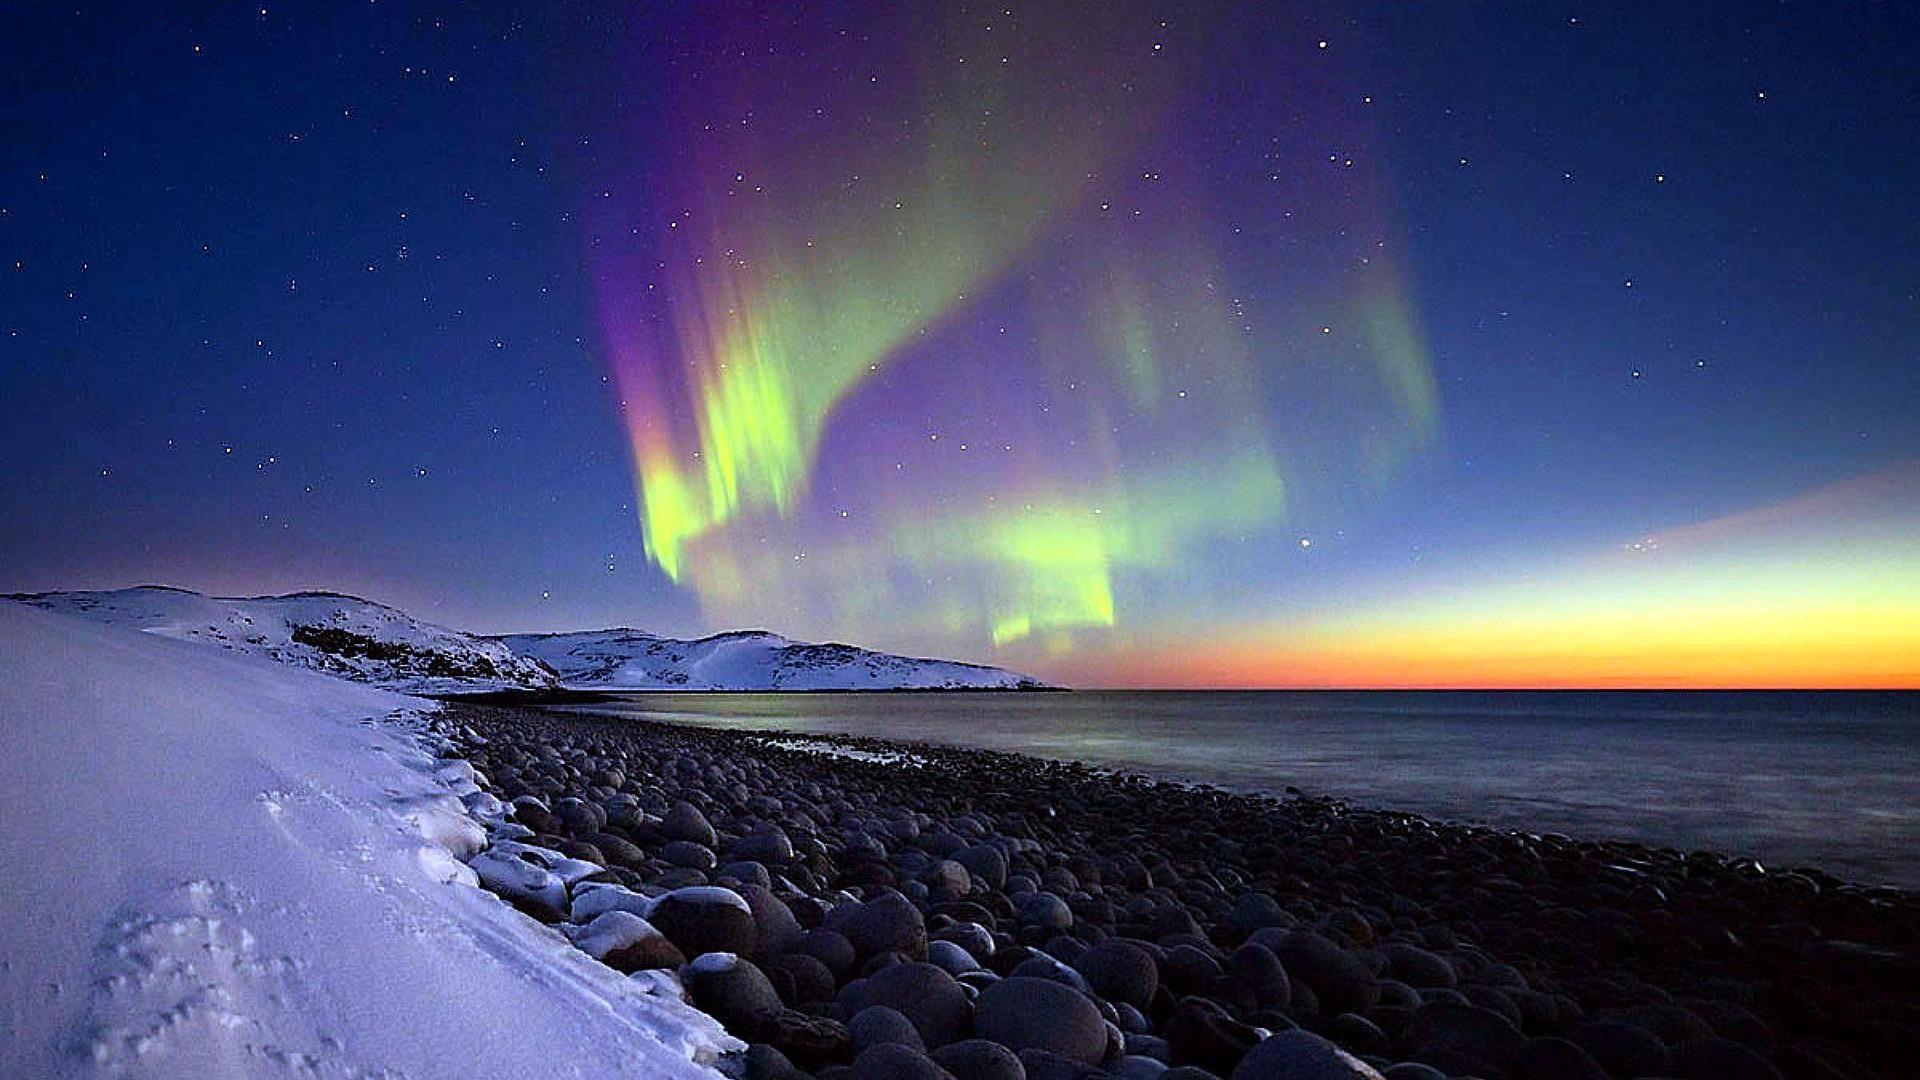 Aurora borealis 5 hd screensavers hd image wallpaper for Aurora boreale sfondo